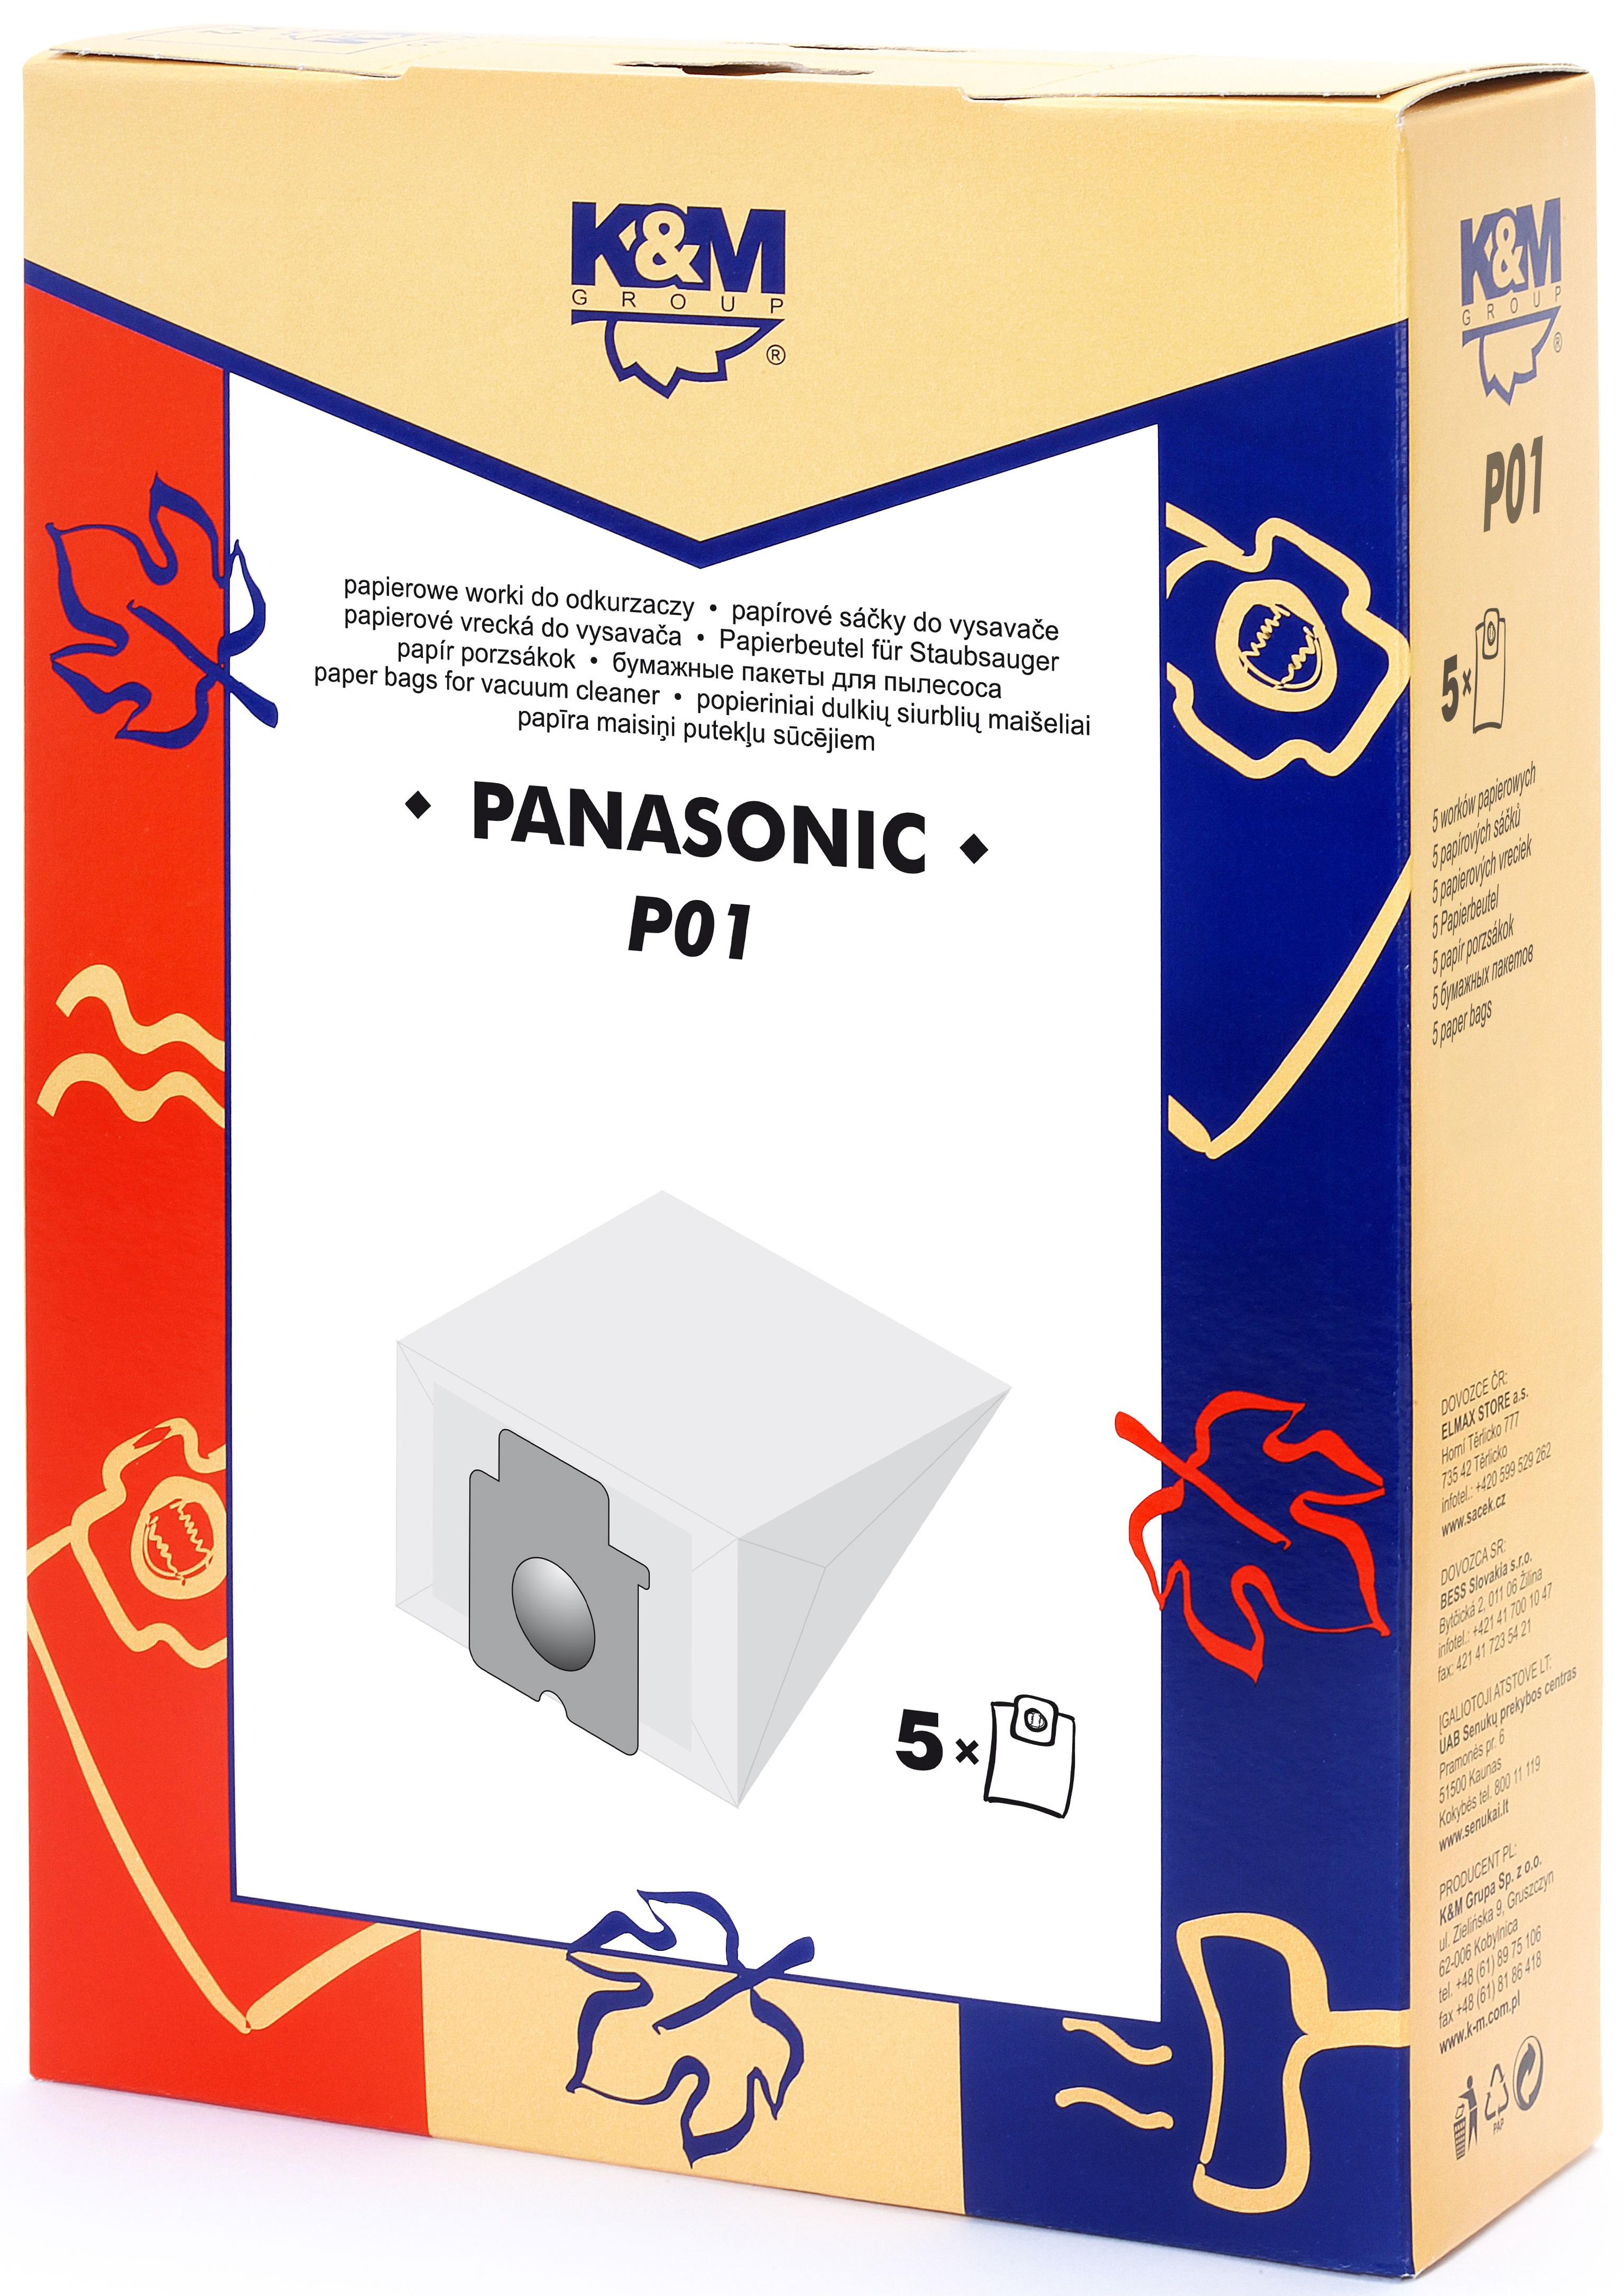 Sac aspirator Panasonic C-2E, hartie, 5X saci, K&M 0